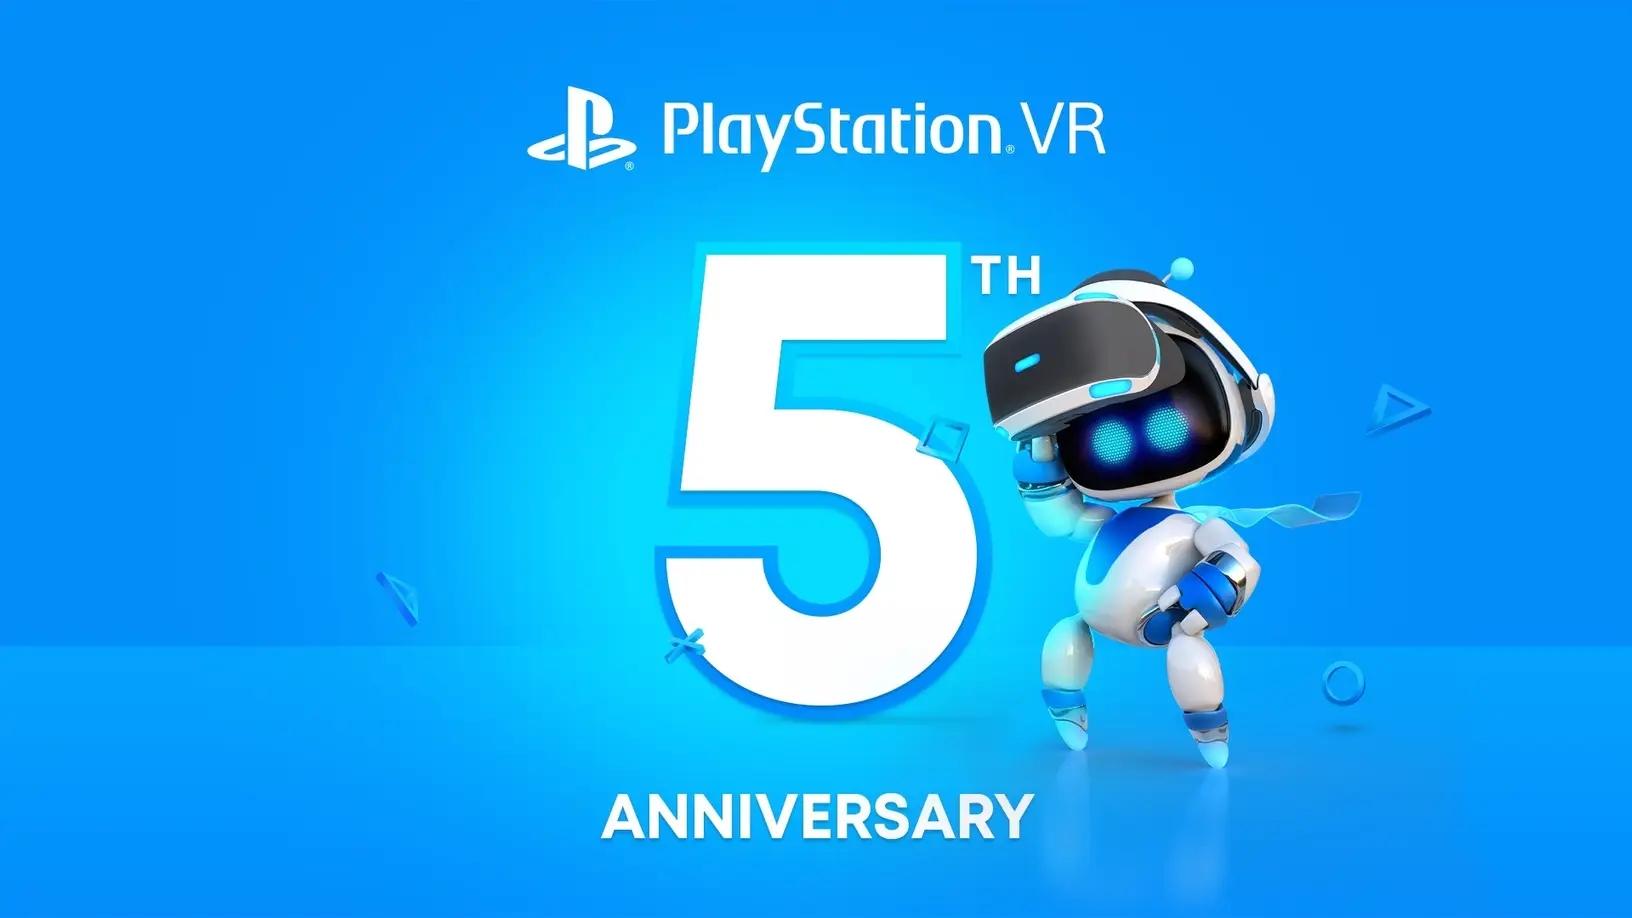 PSVR 5周年赠送三款PSVR游戏 PS+会员11月六款游戏免费体验